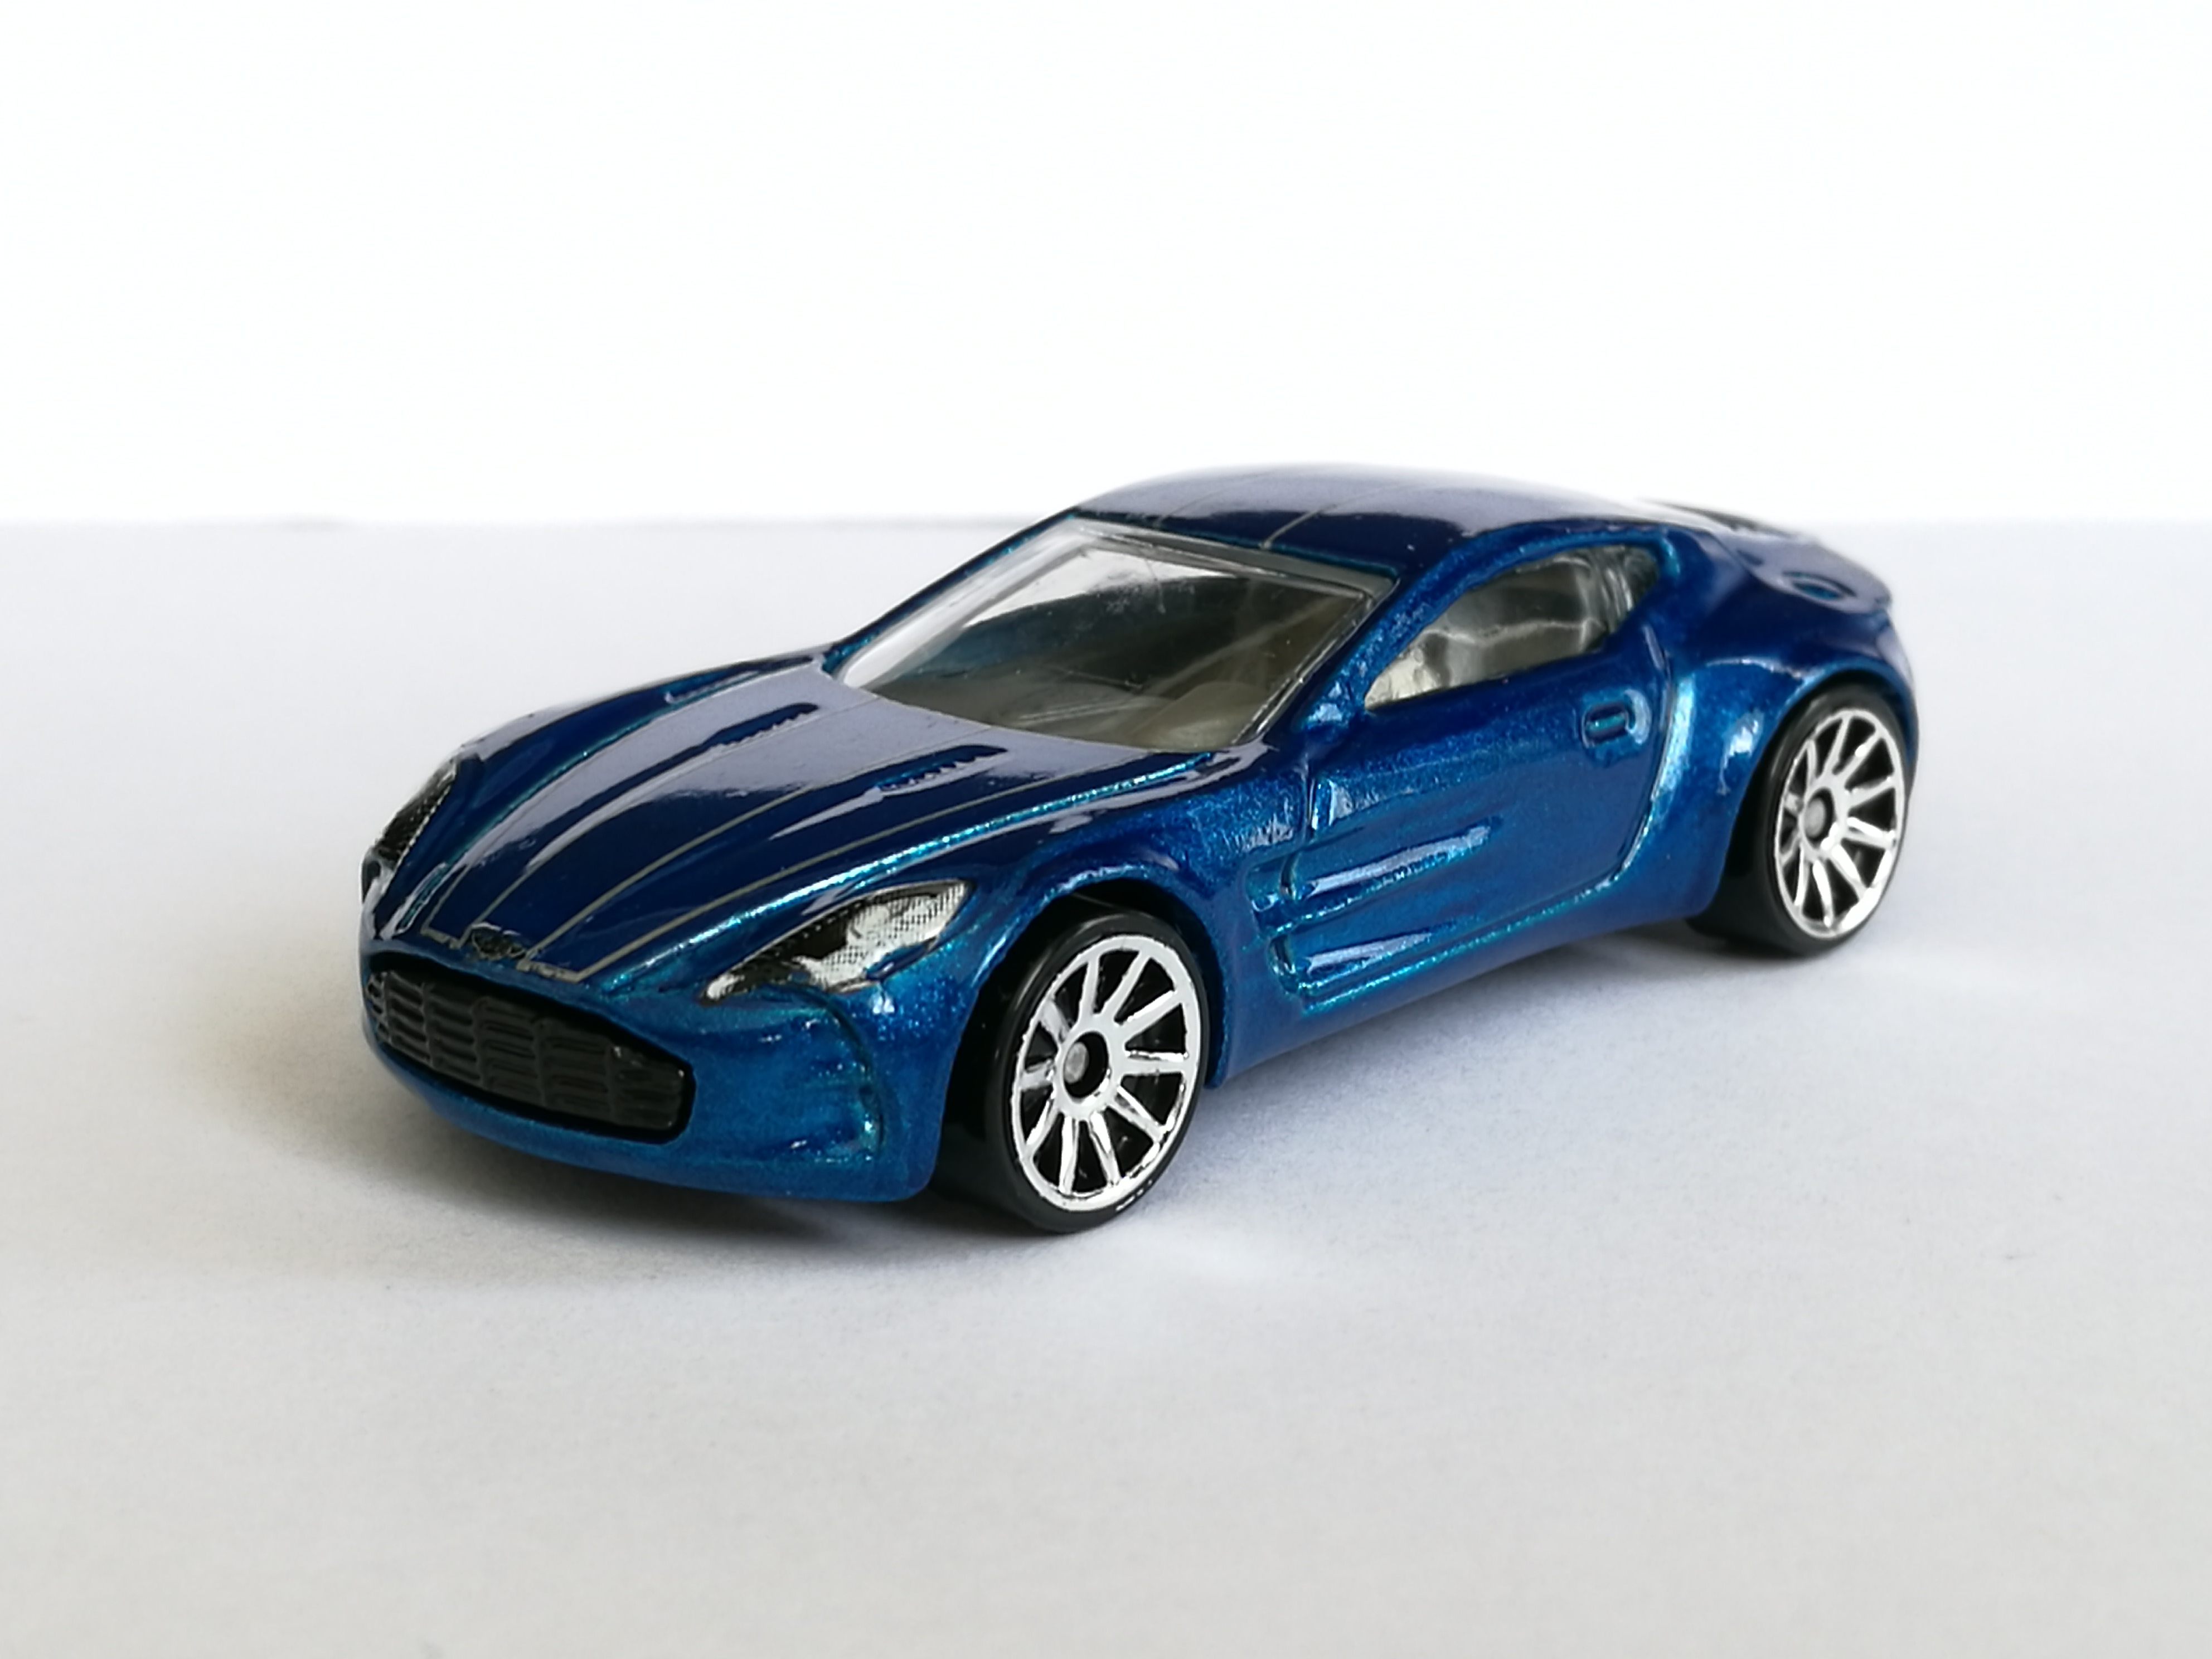 Hot Wheels 2018 117 365 Aston Martin One 77 Green Hw Exotics Contemporary Manufacture Diecast Cars Trucks Vans